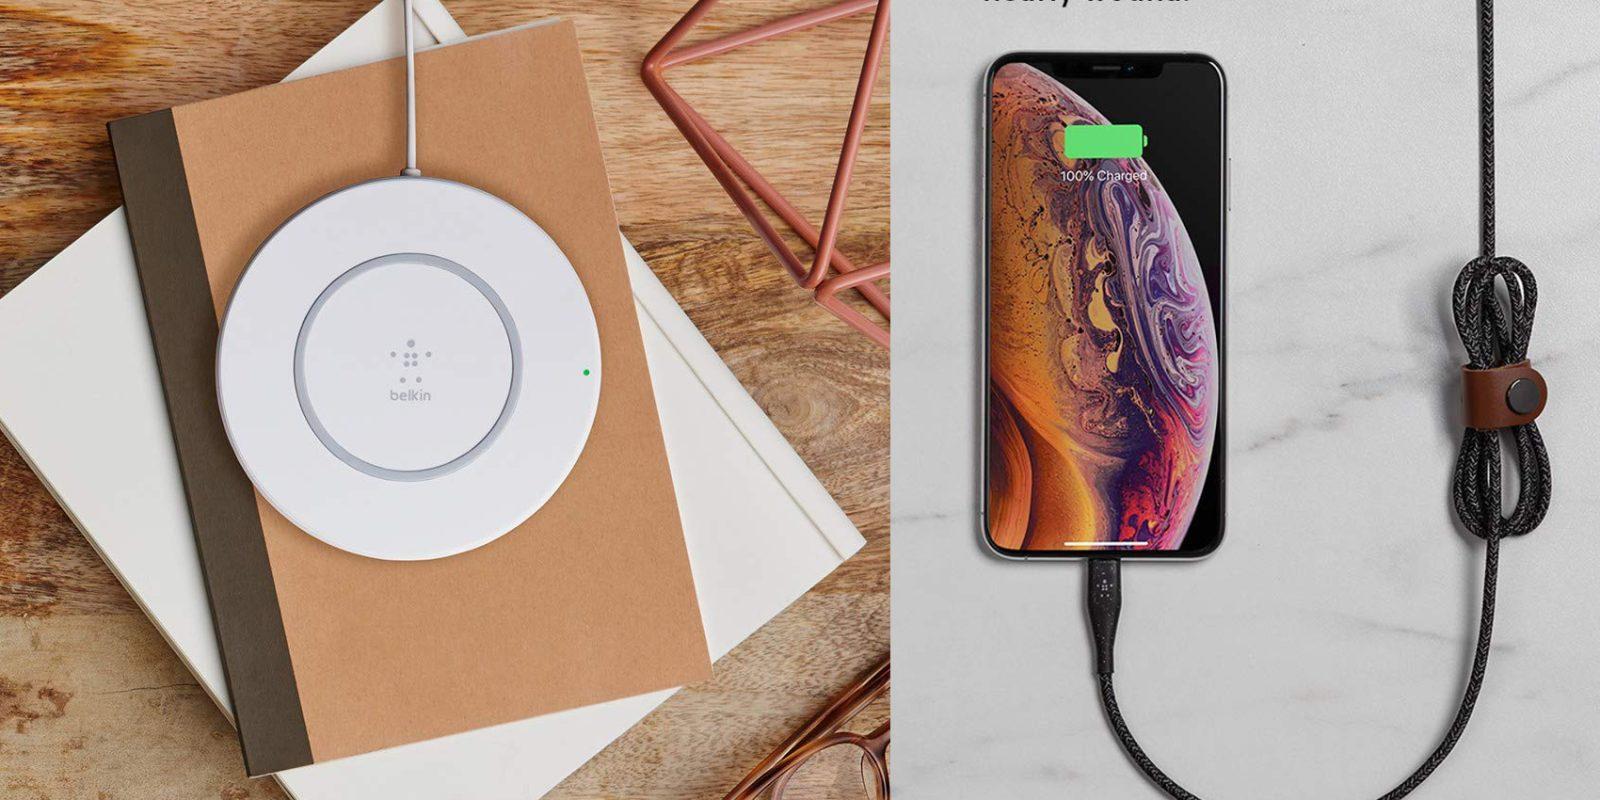 Amazon wireless charging accessory sale from $12: Belkin, mophie, iOttie, more